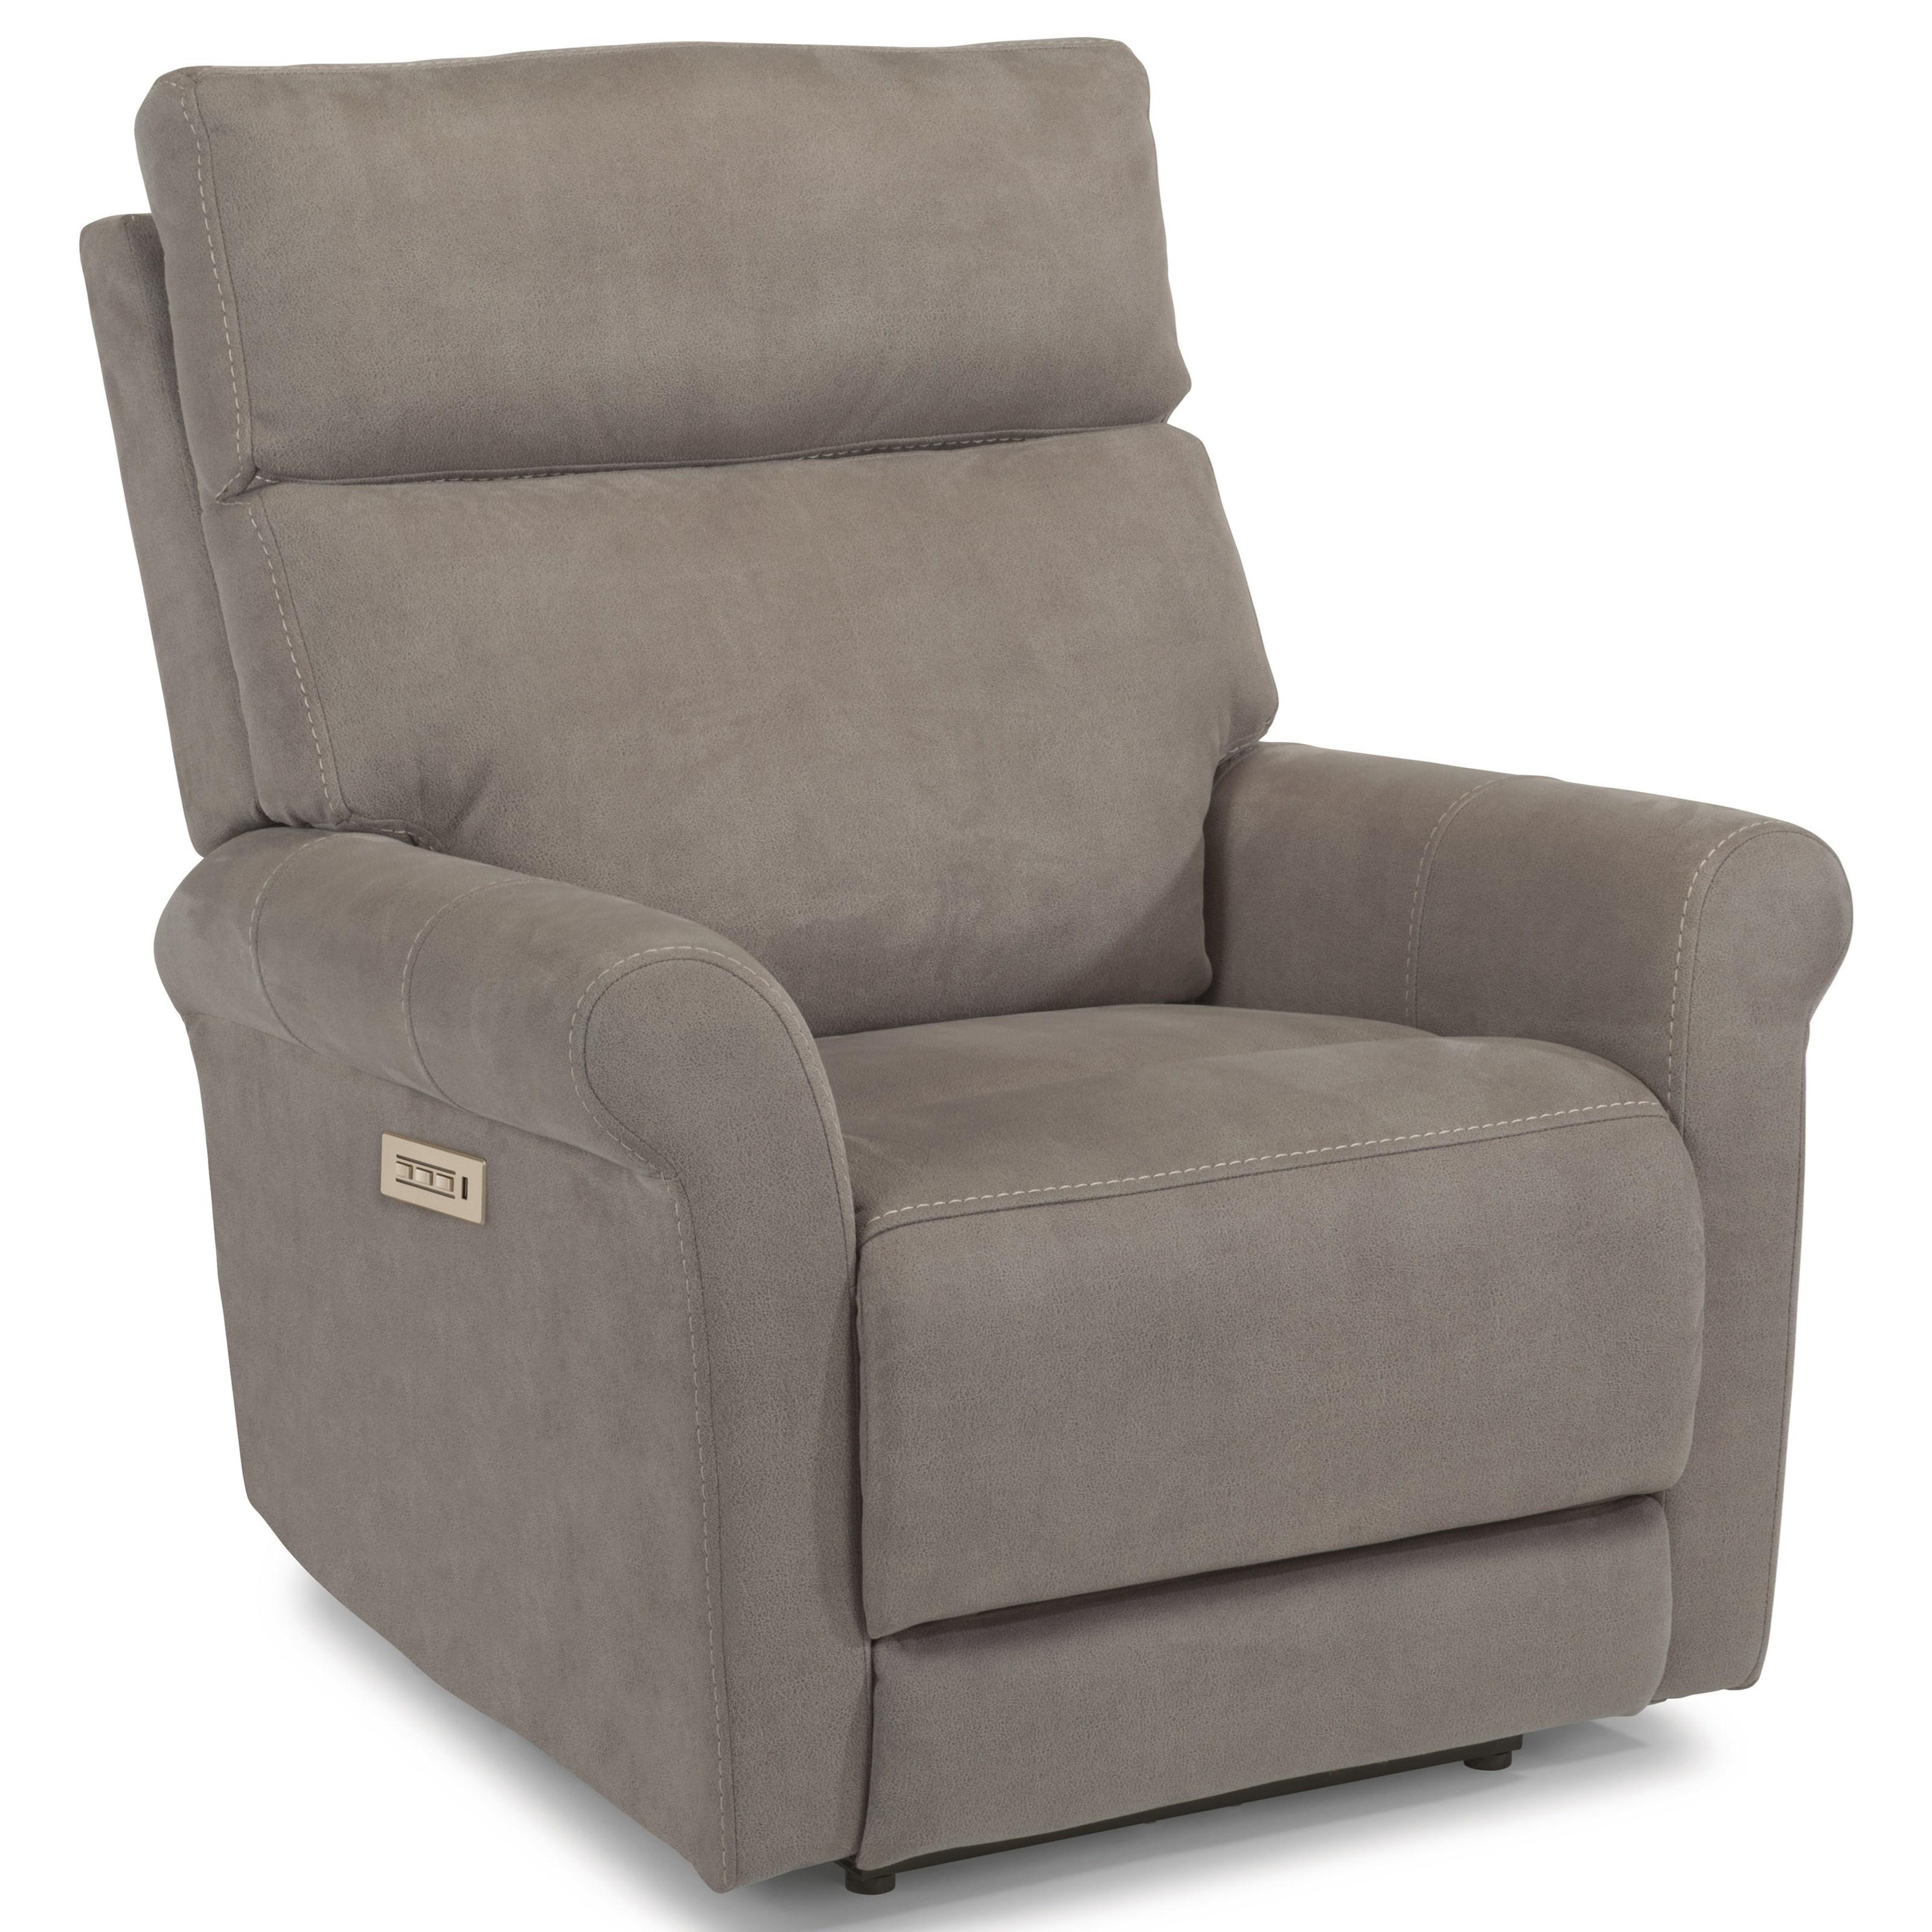 Flexsteel Electric Sofa: Owen Contemporary Power Recliner